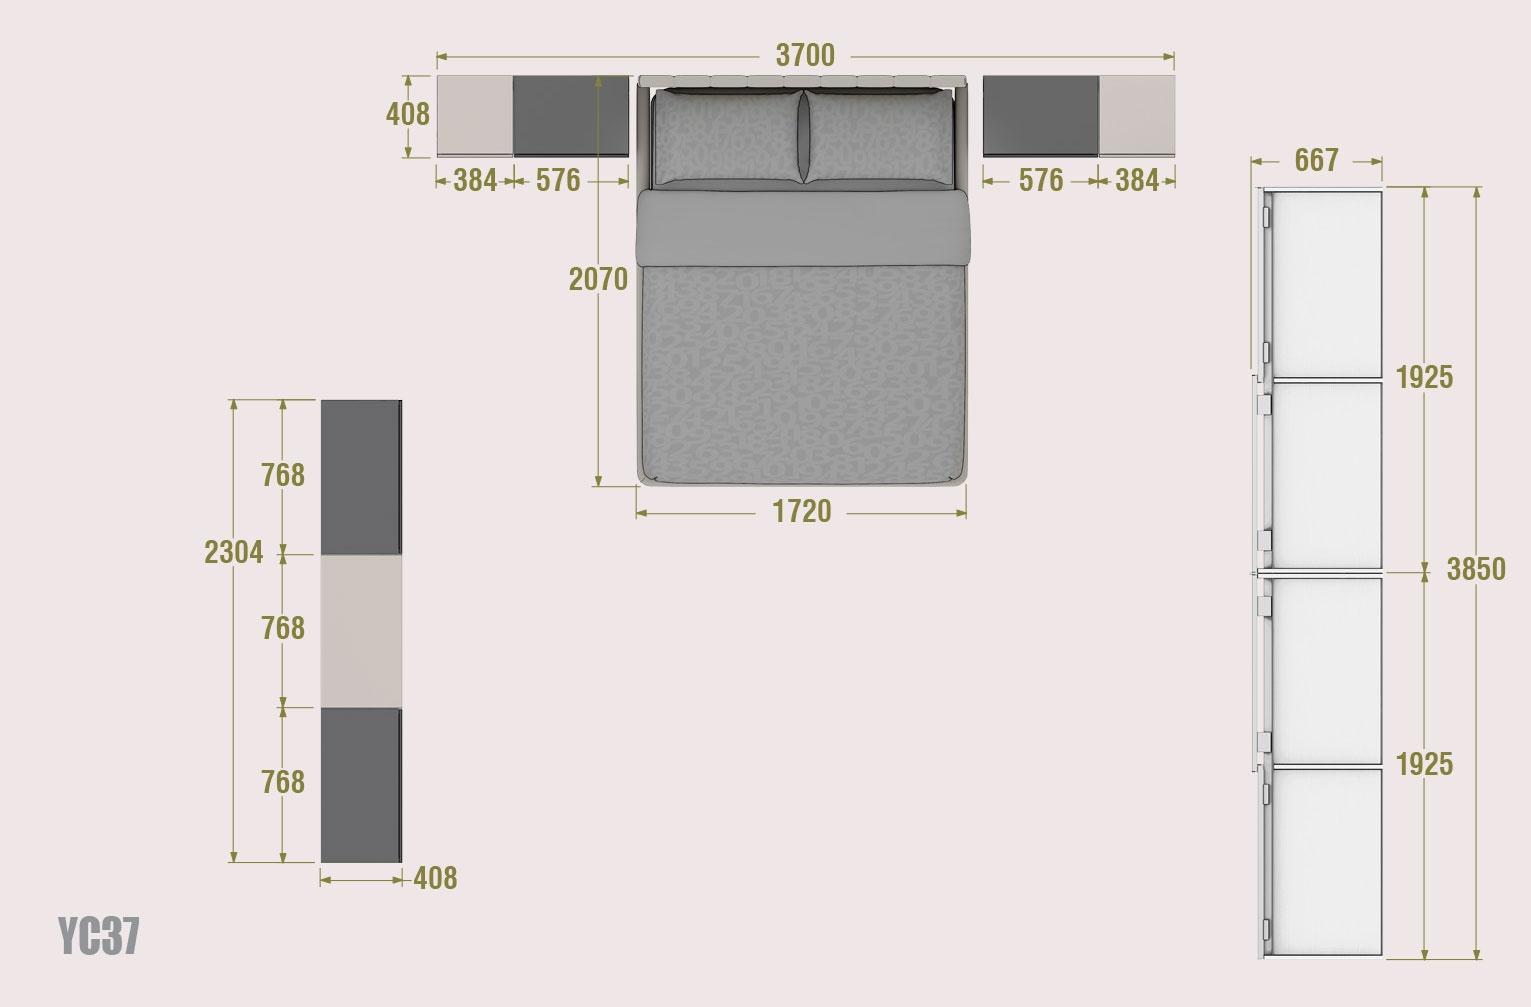 Chambre adulte avec lit 2 personnes moretti compact so for Chambre 2 personnes complete